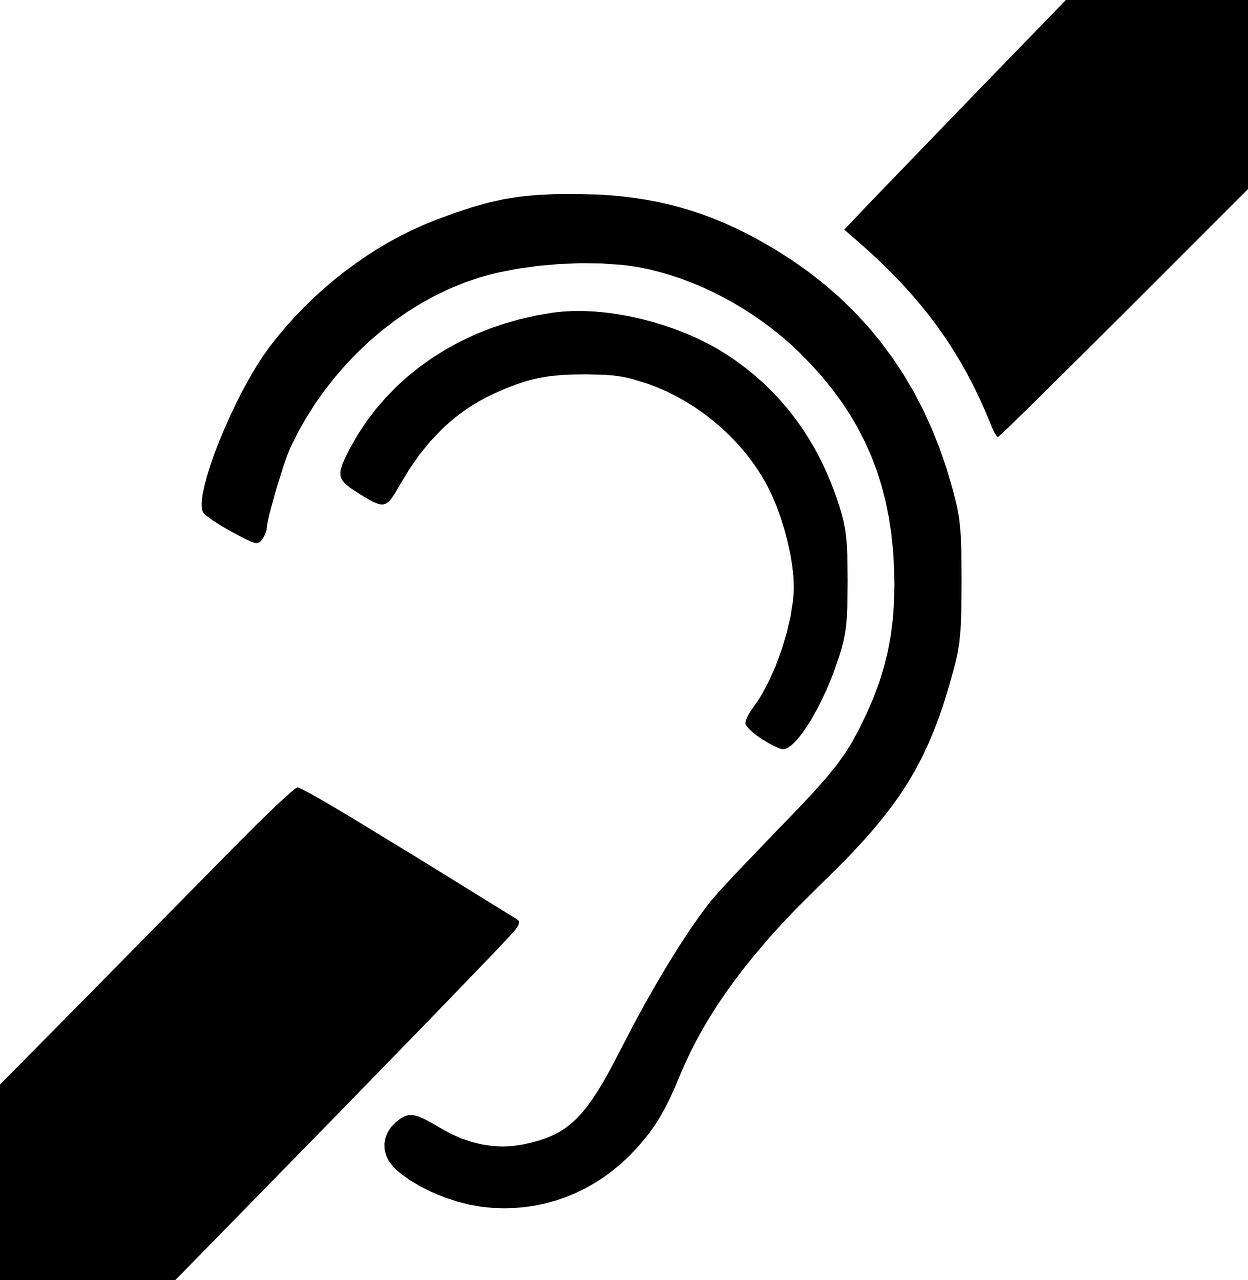 Symbolbild Taub